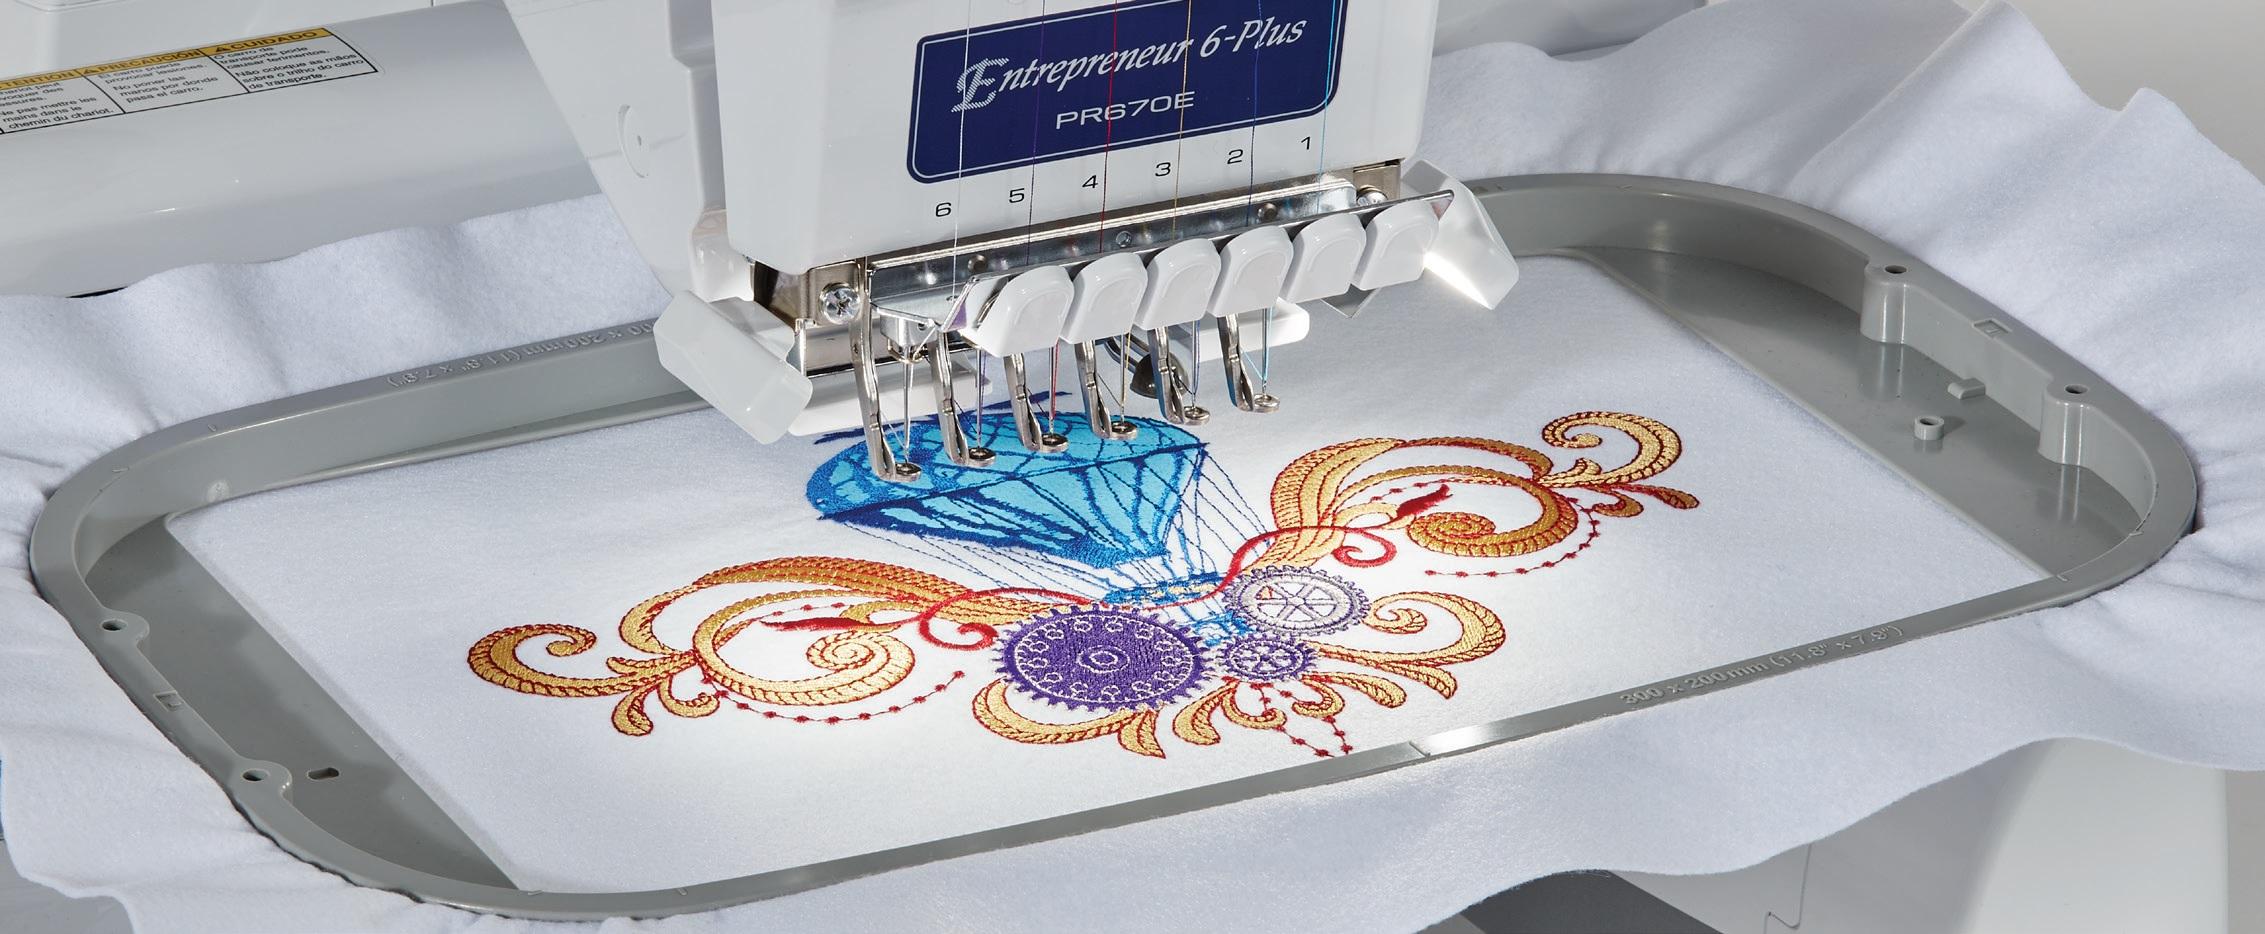 large embroidery area pr670e